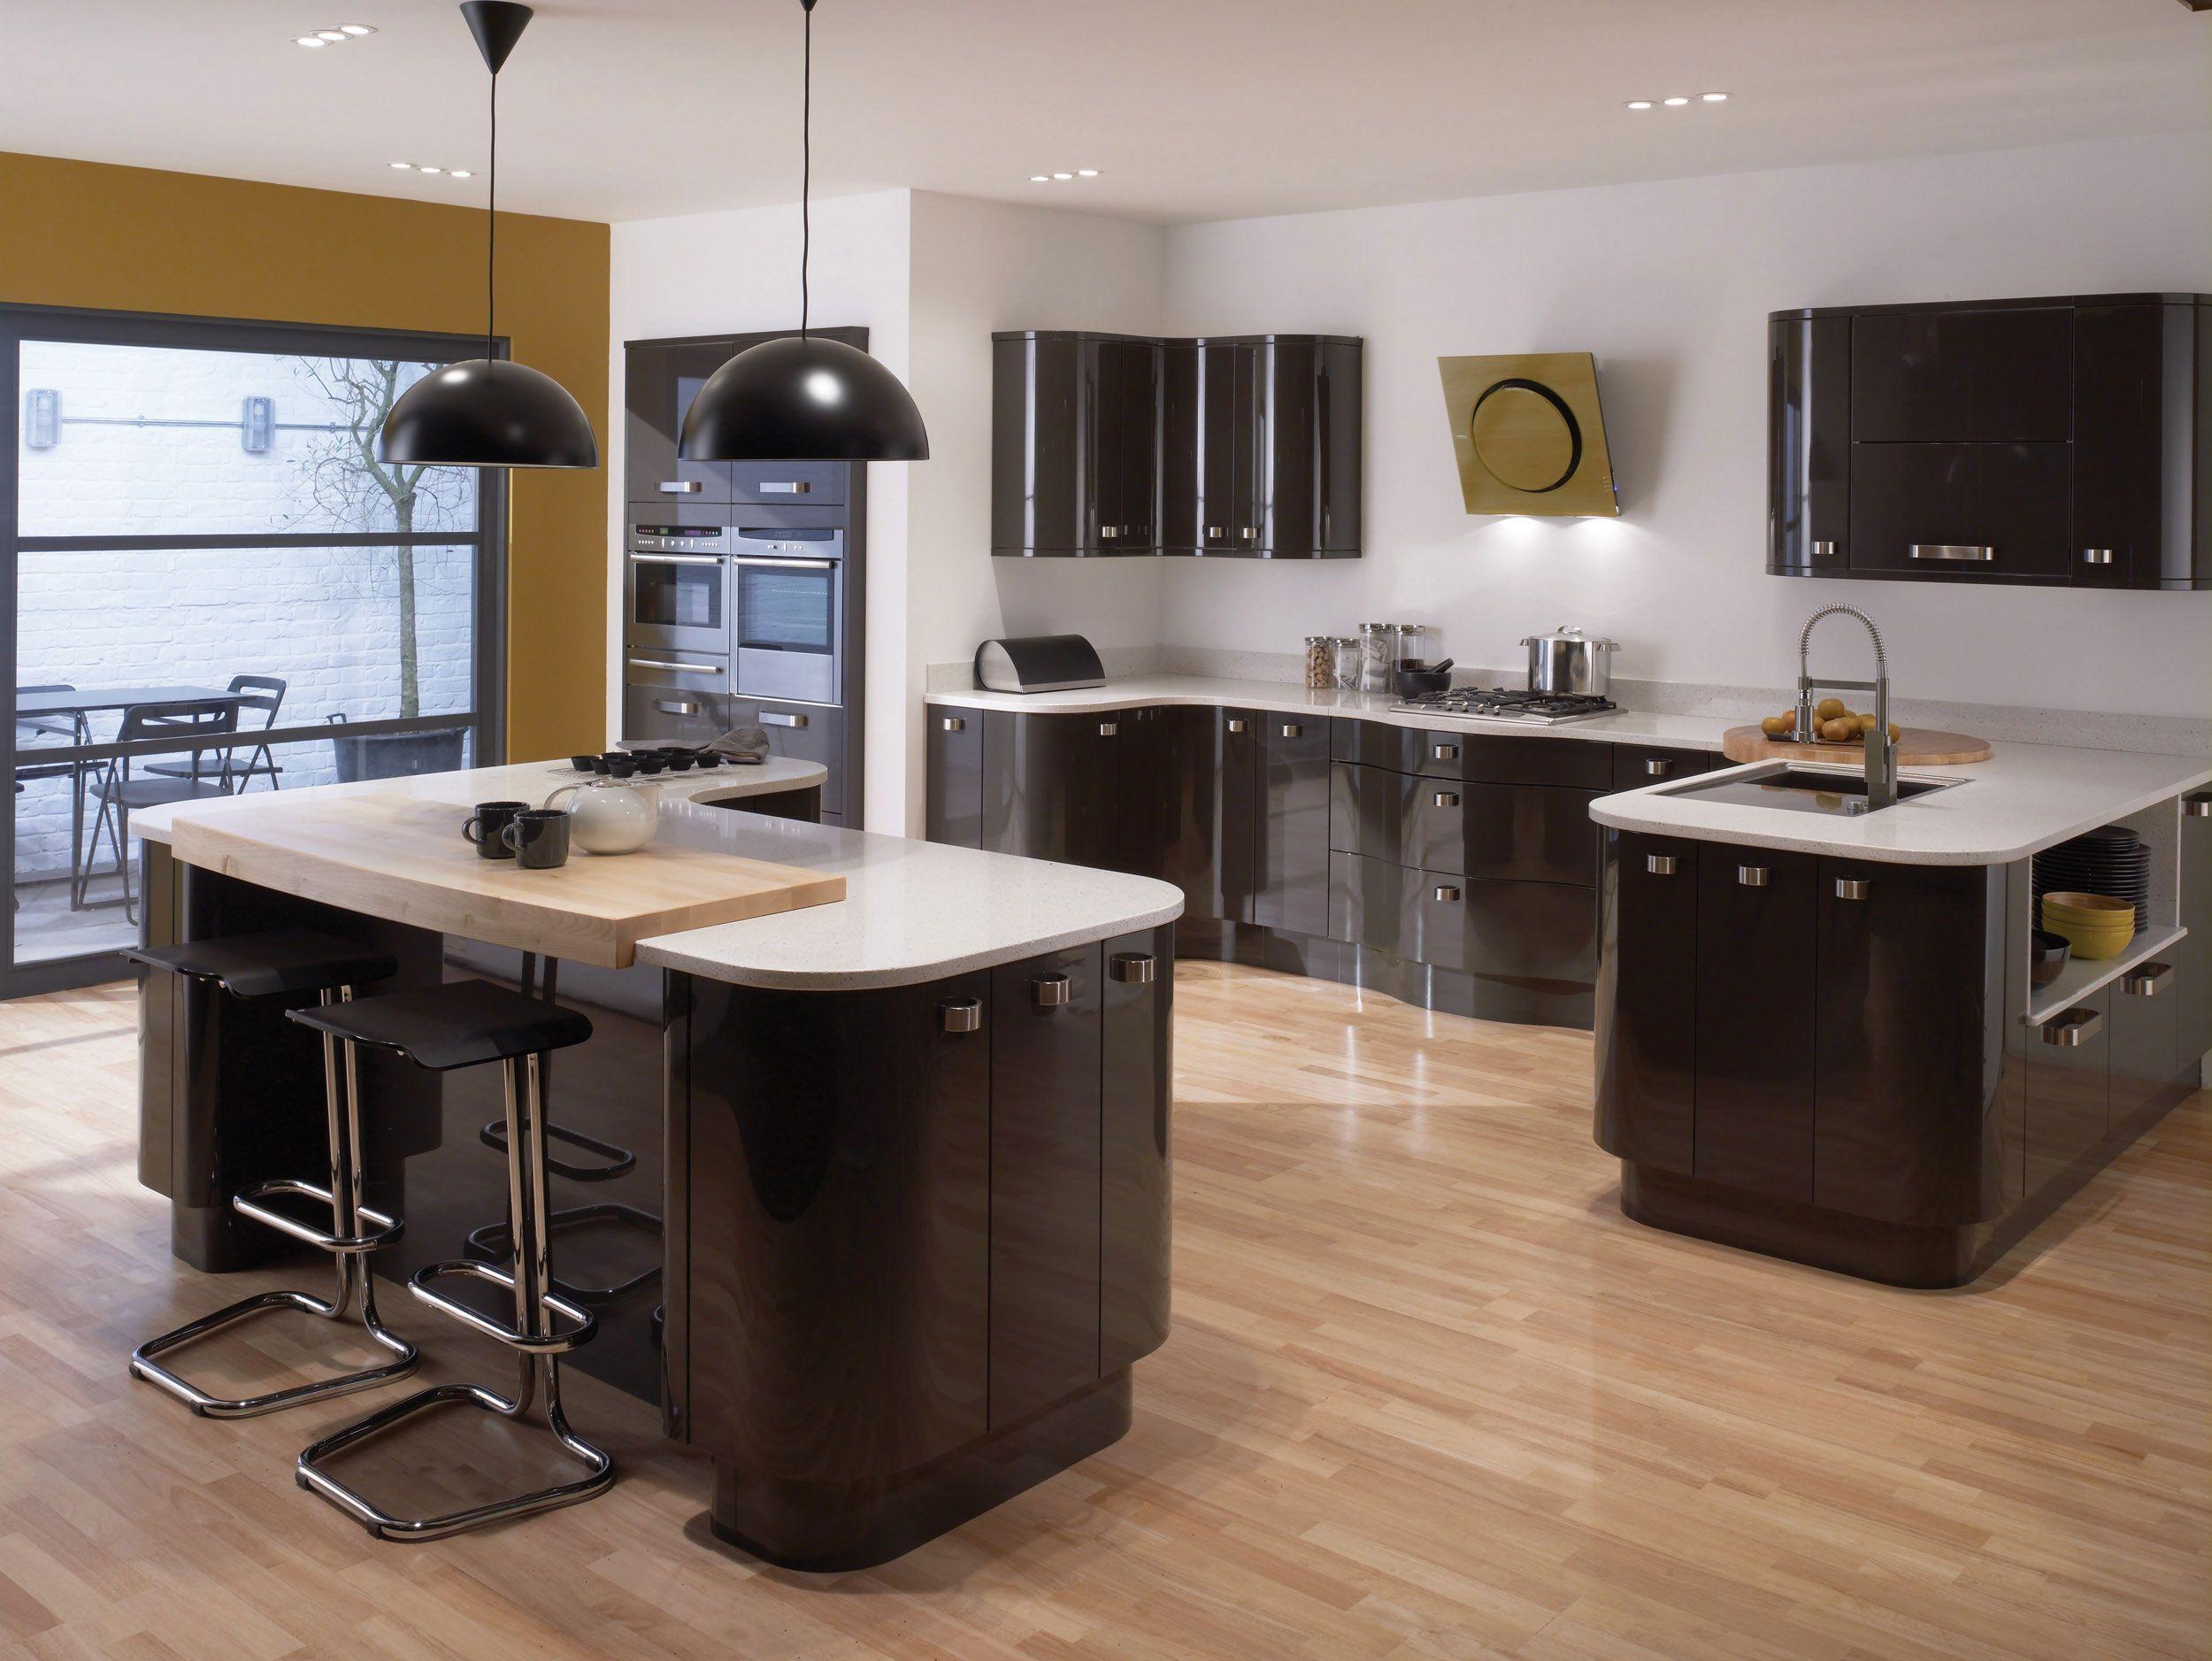 Ideas Free Standing Kitchen Islands In 2020 Contemporary Kitchen